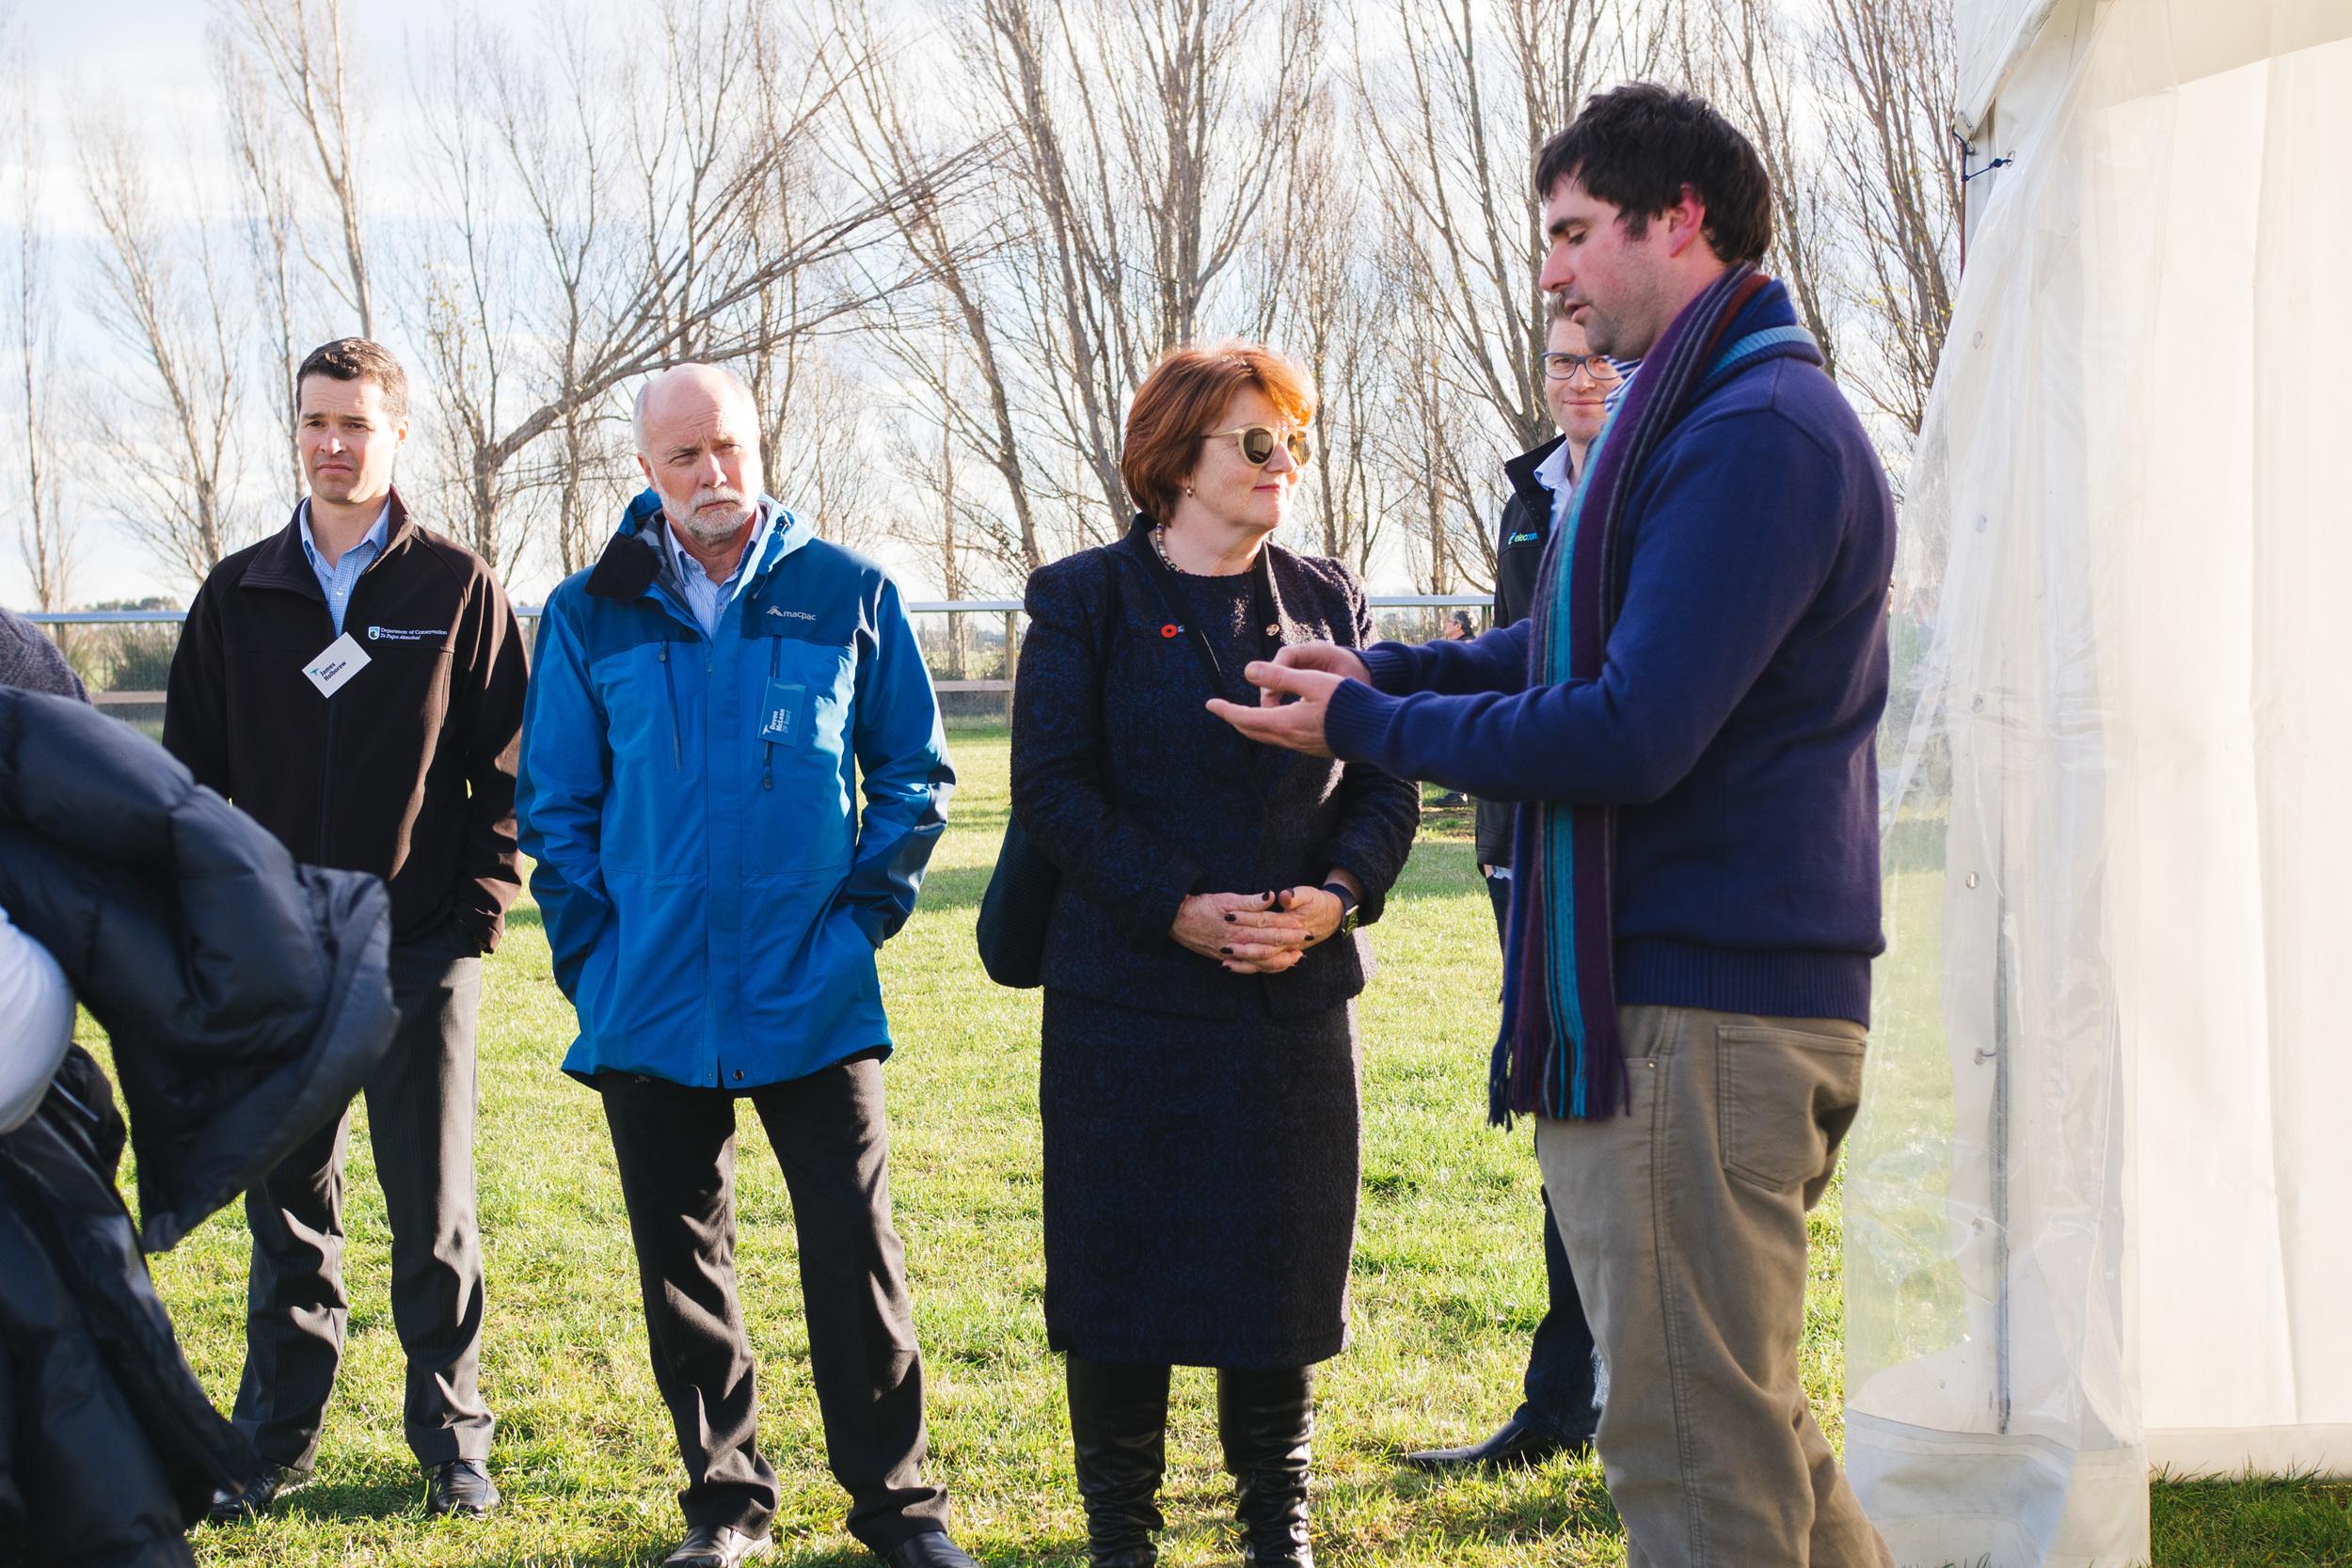 L-R: James Holborow (DOC), Devon McLean, Hon Maggie Barry, Stuart Pearson (Eleccom Design Limited), Tim Sjoberg (ZIP Animal Behaviour Technician)